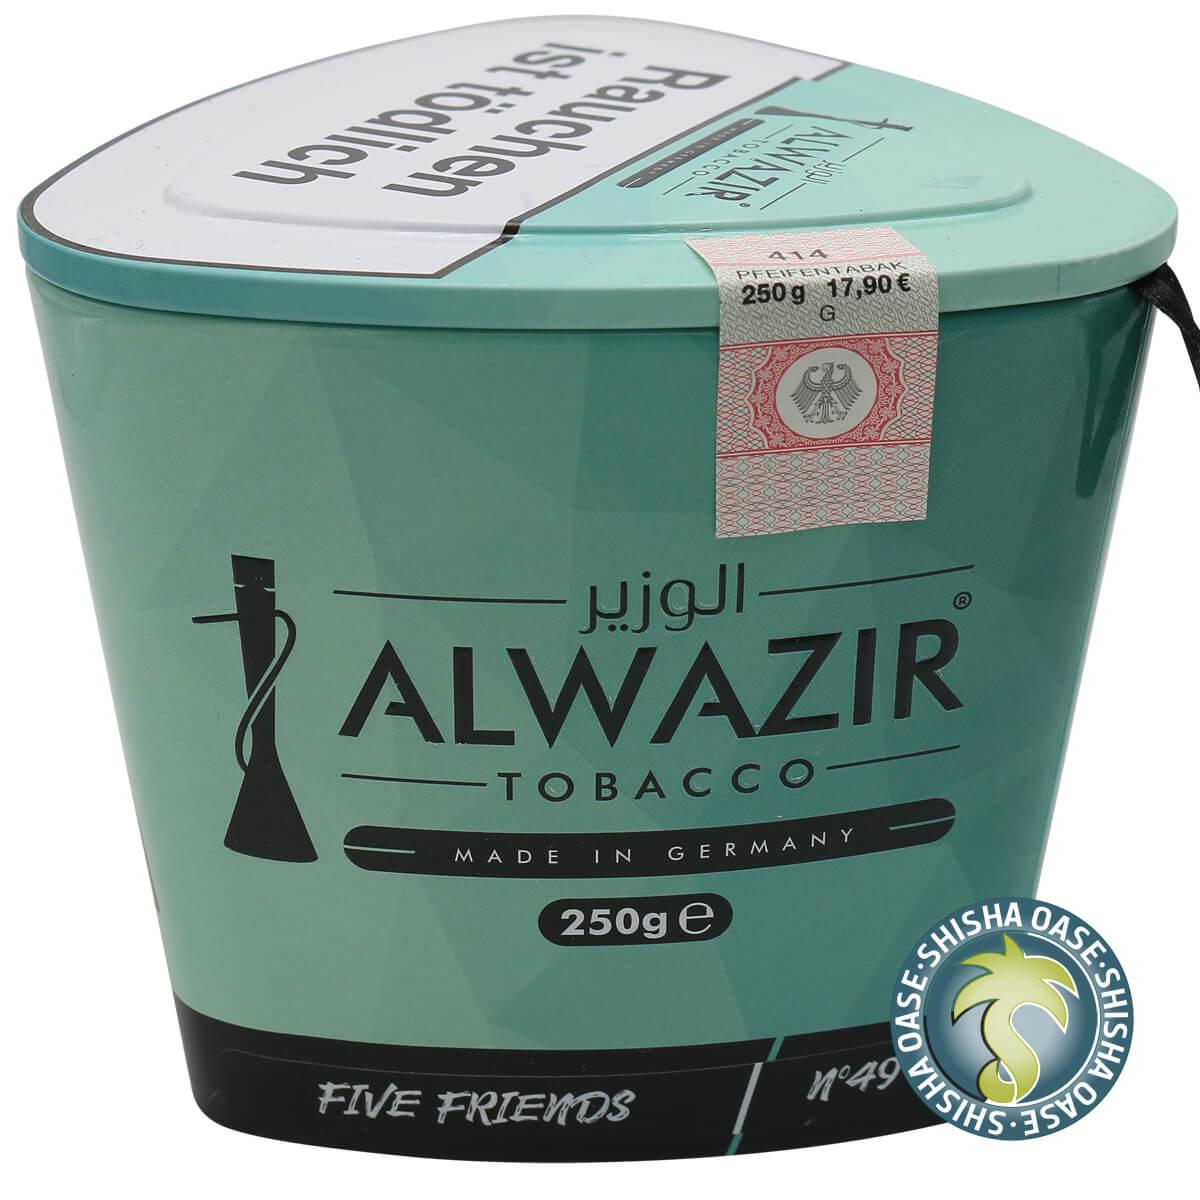 Al Wazir Tabak 250g Dose | Five Friends No.49